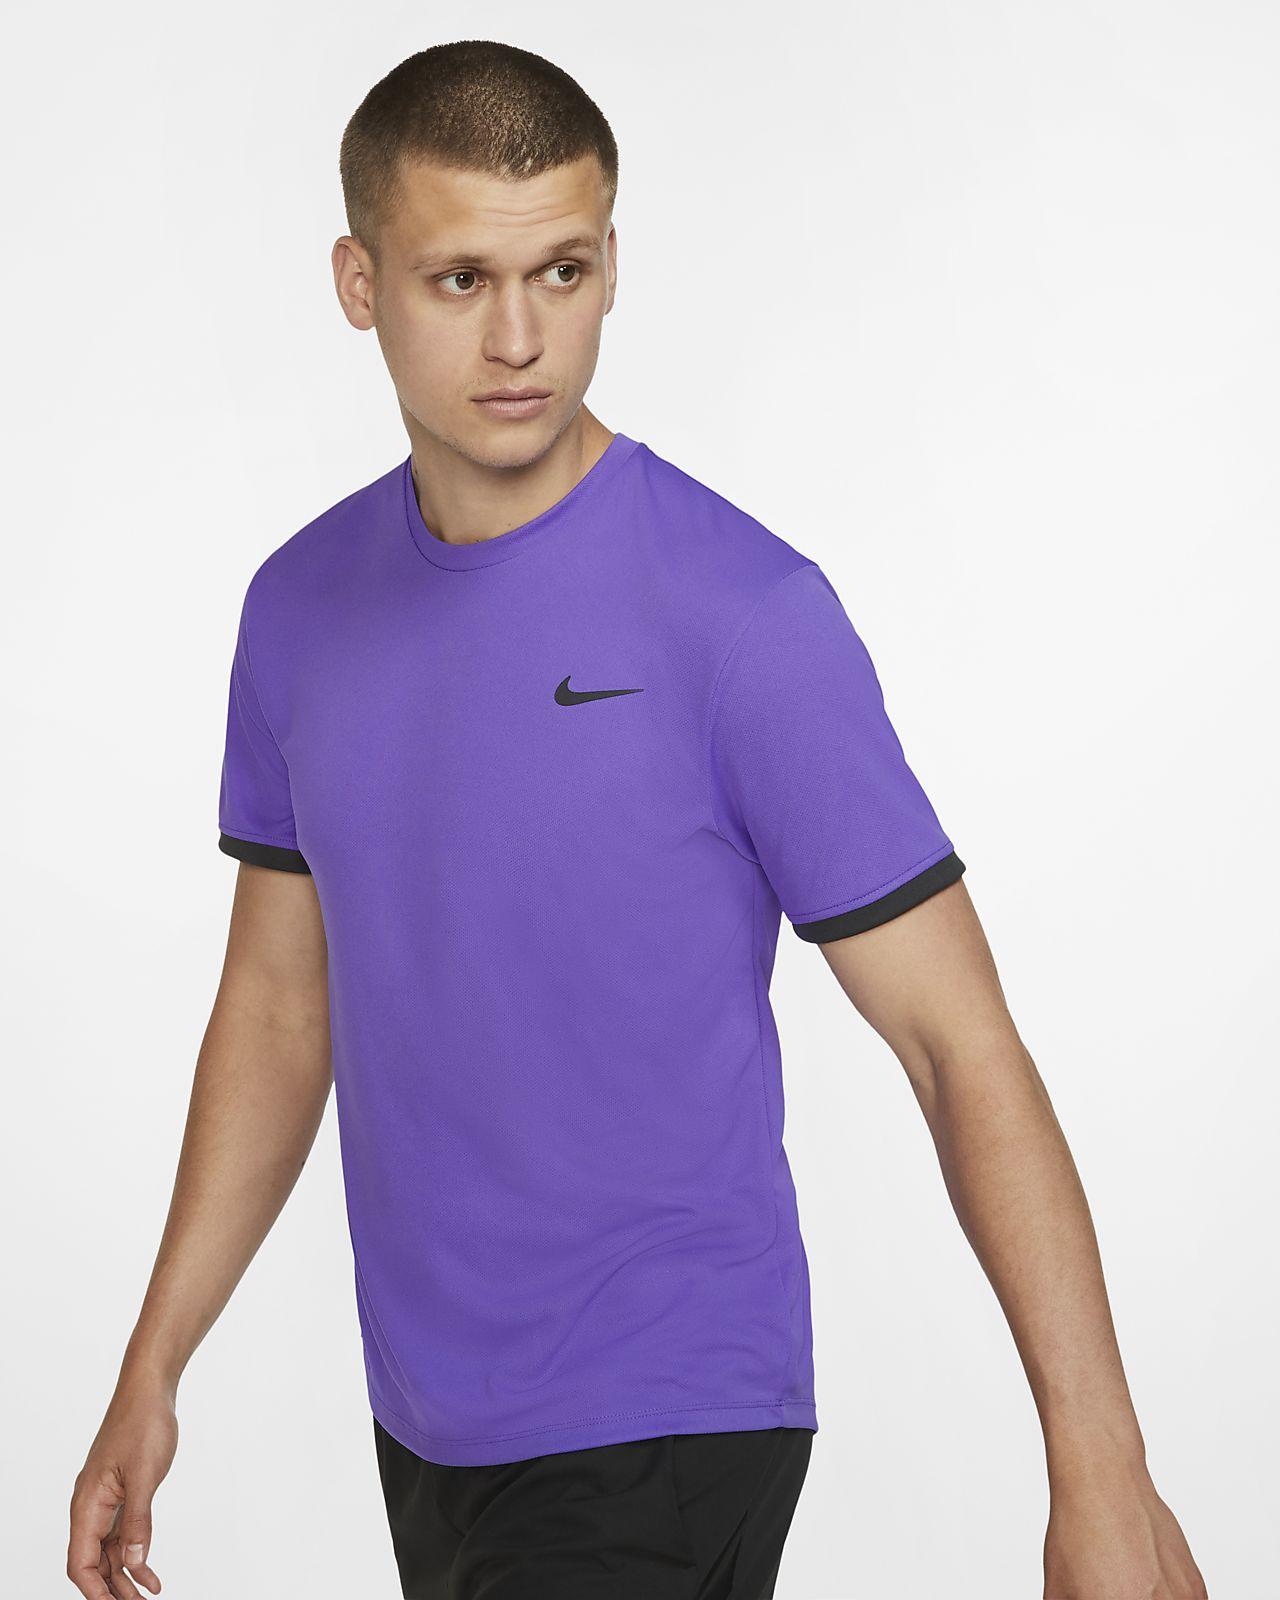 NikeCourt Dri-FIT Kısa Kollu Erkek Tenis Üstü